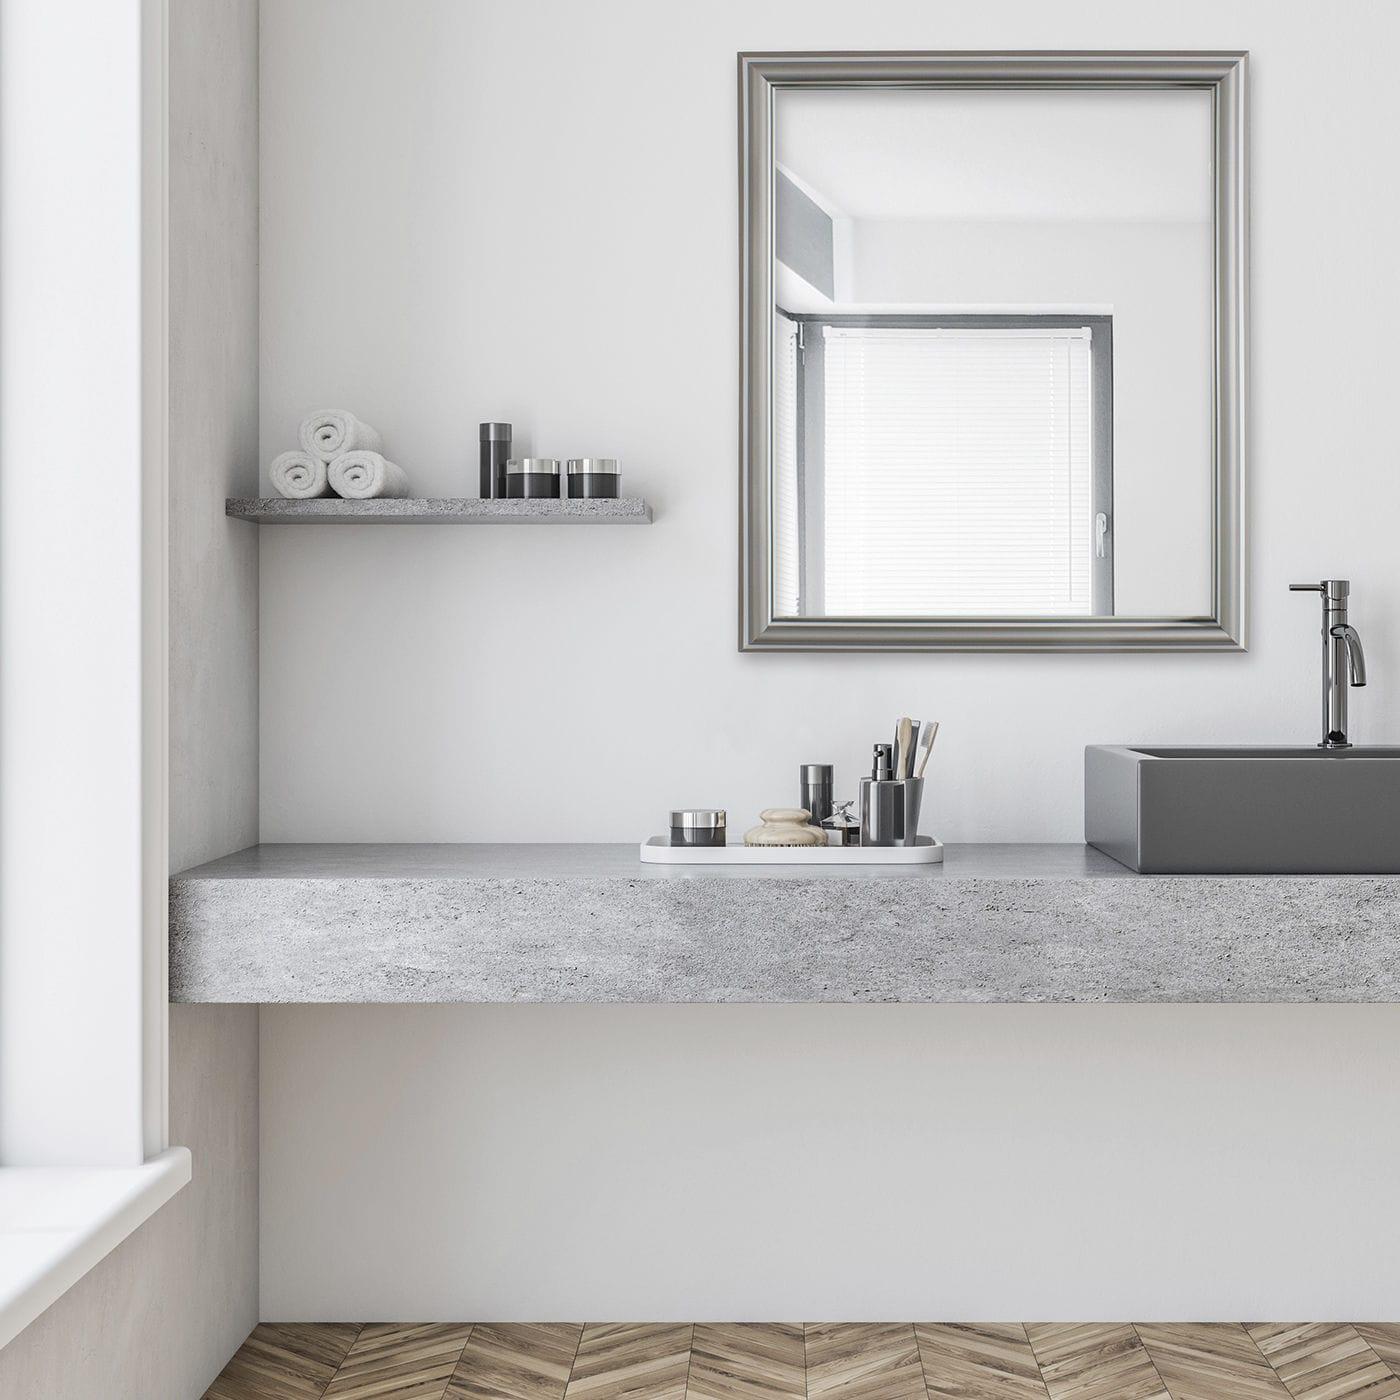 Wall Mounted Bathroom Mirror Palace Light Top Light Gmbh Co Kg Led Illuminated Contemporary Rectangular